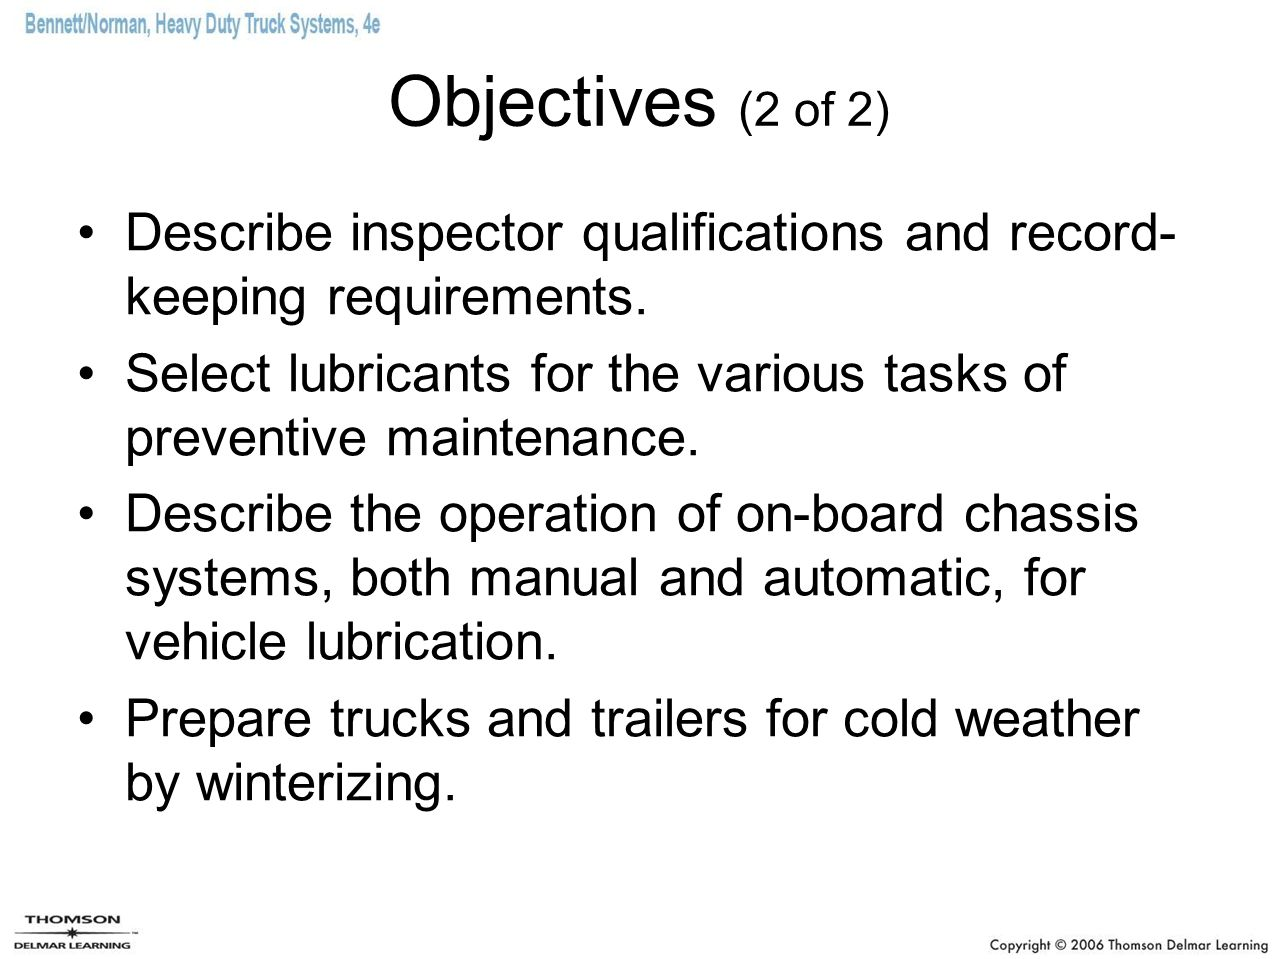 Chapter 4 Preventive Maintenance Program  Objectives (1 of 2